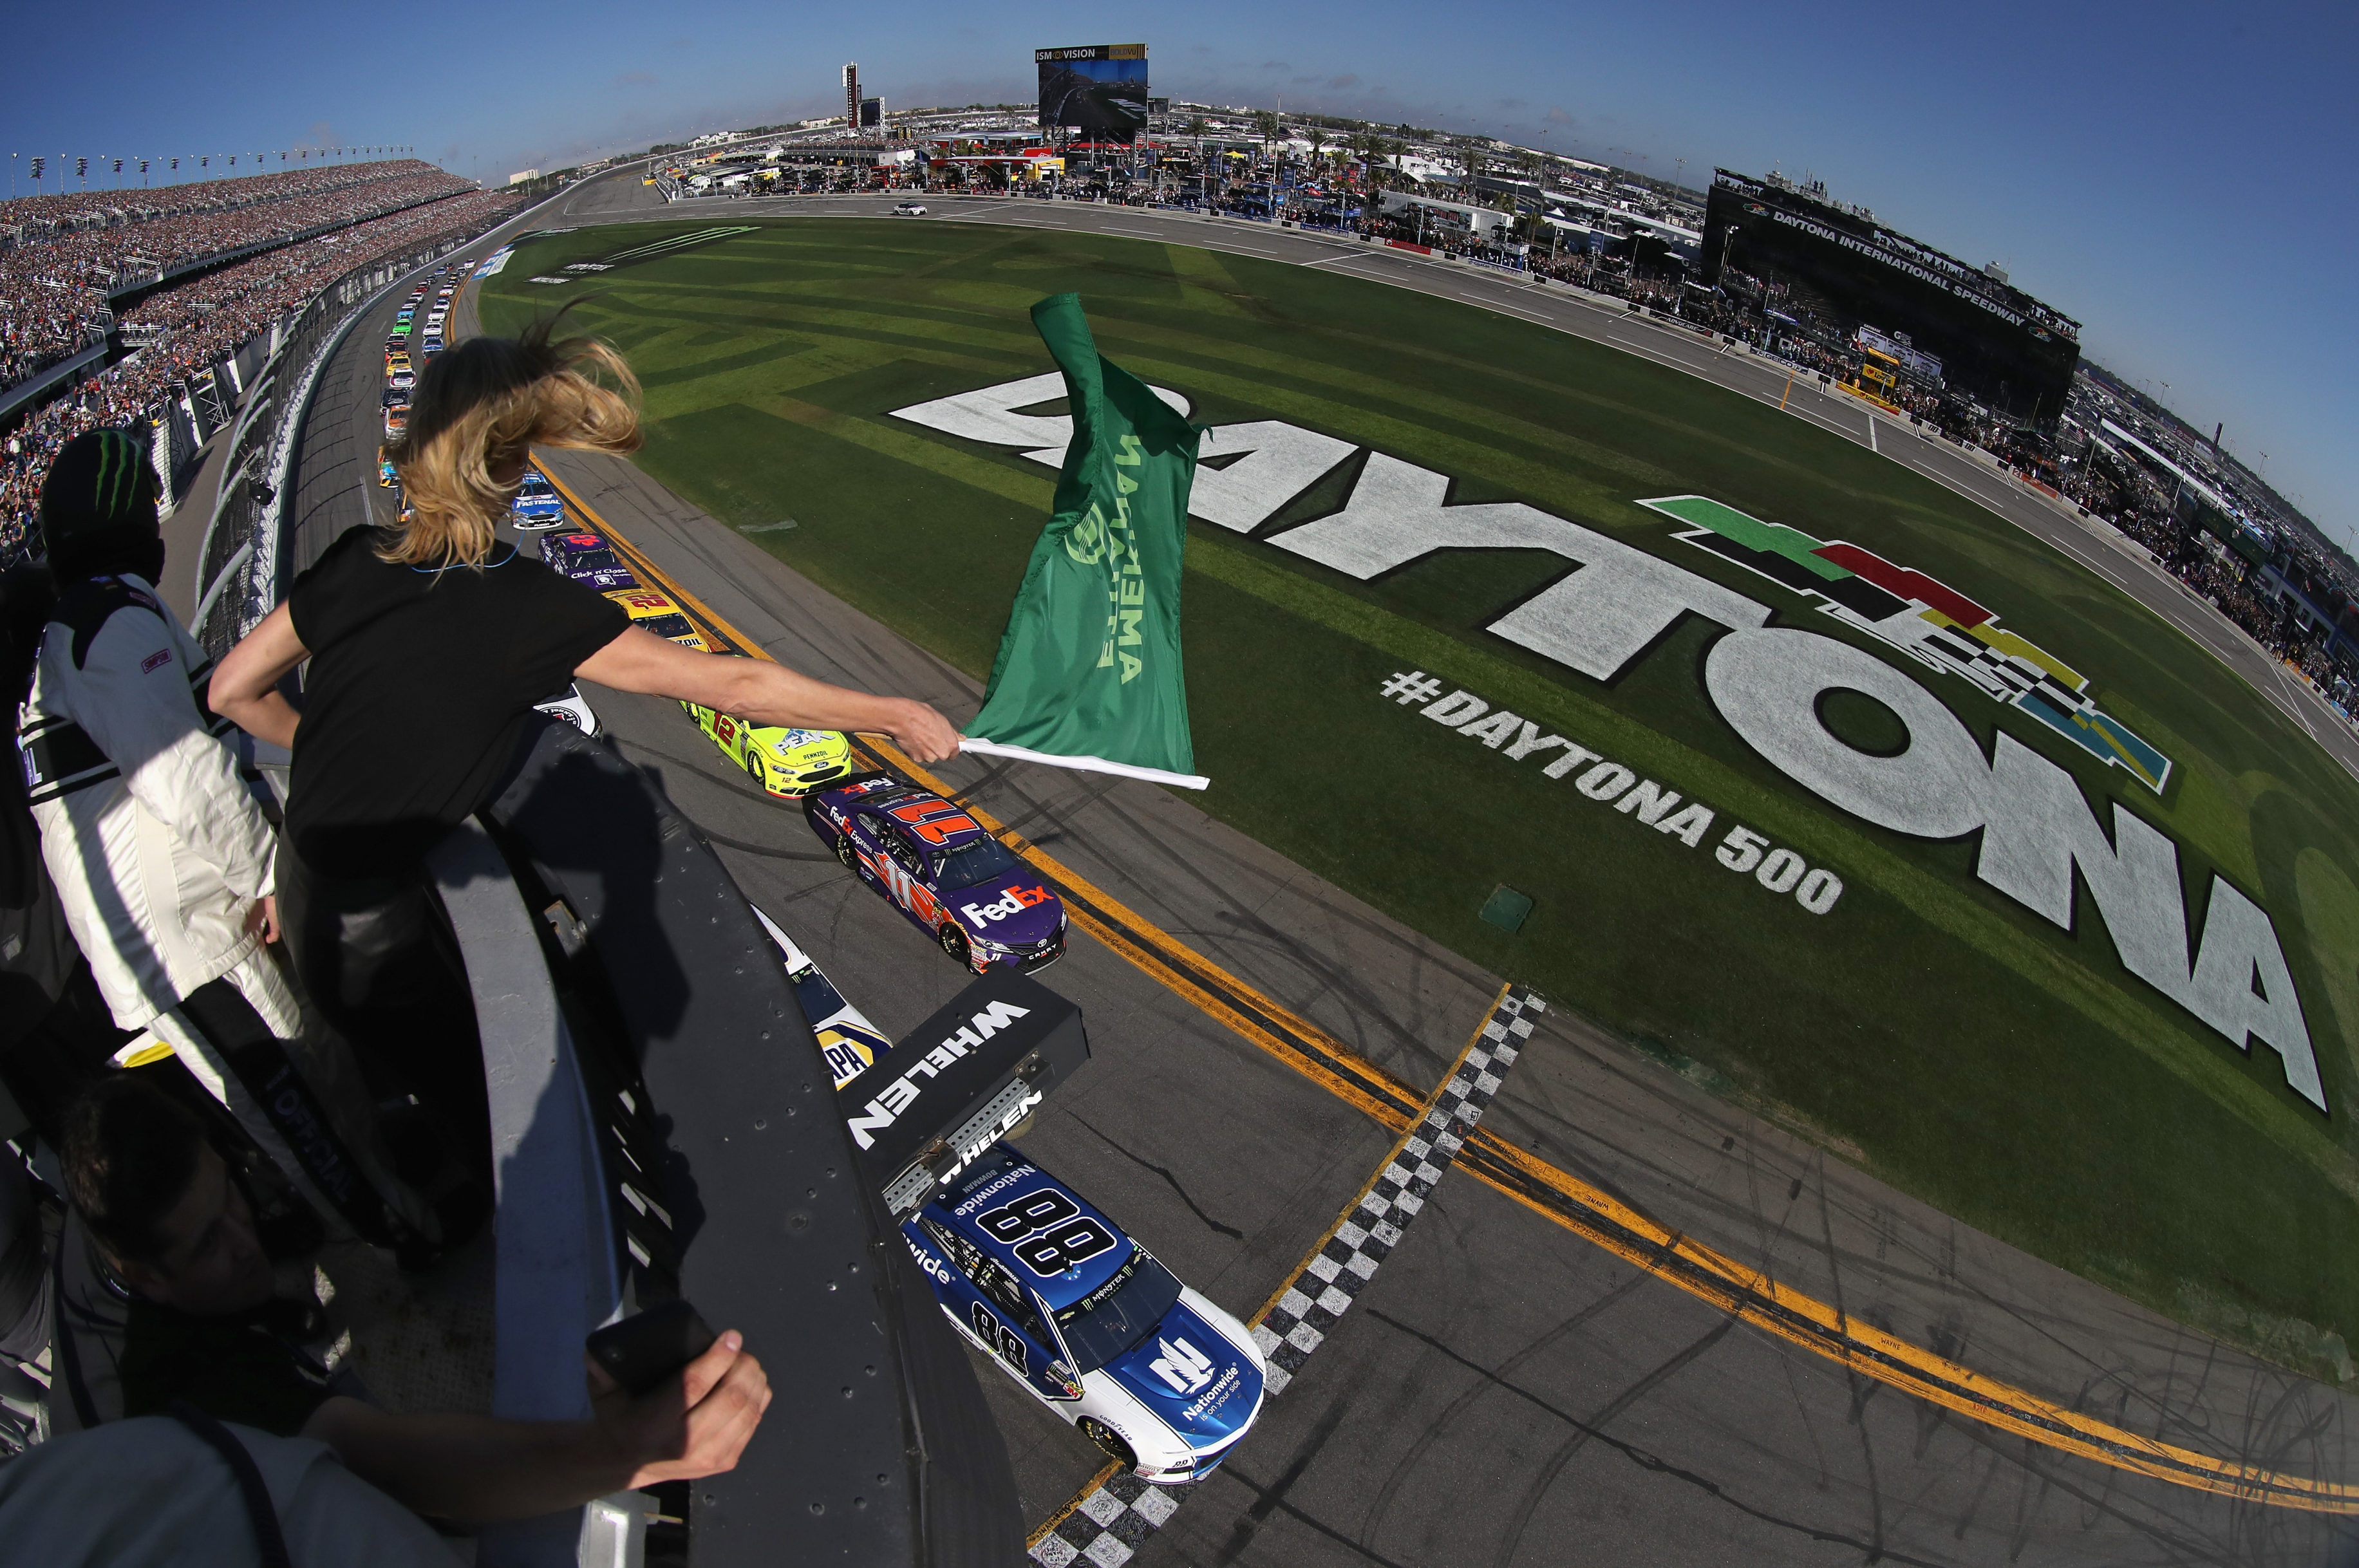 2018 Daytona 500 start - Alex Bowman and Denny Hamlin